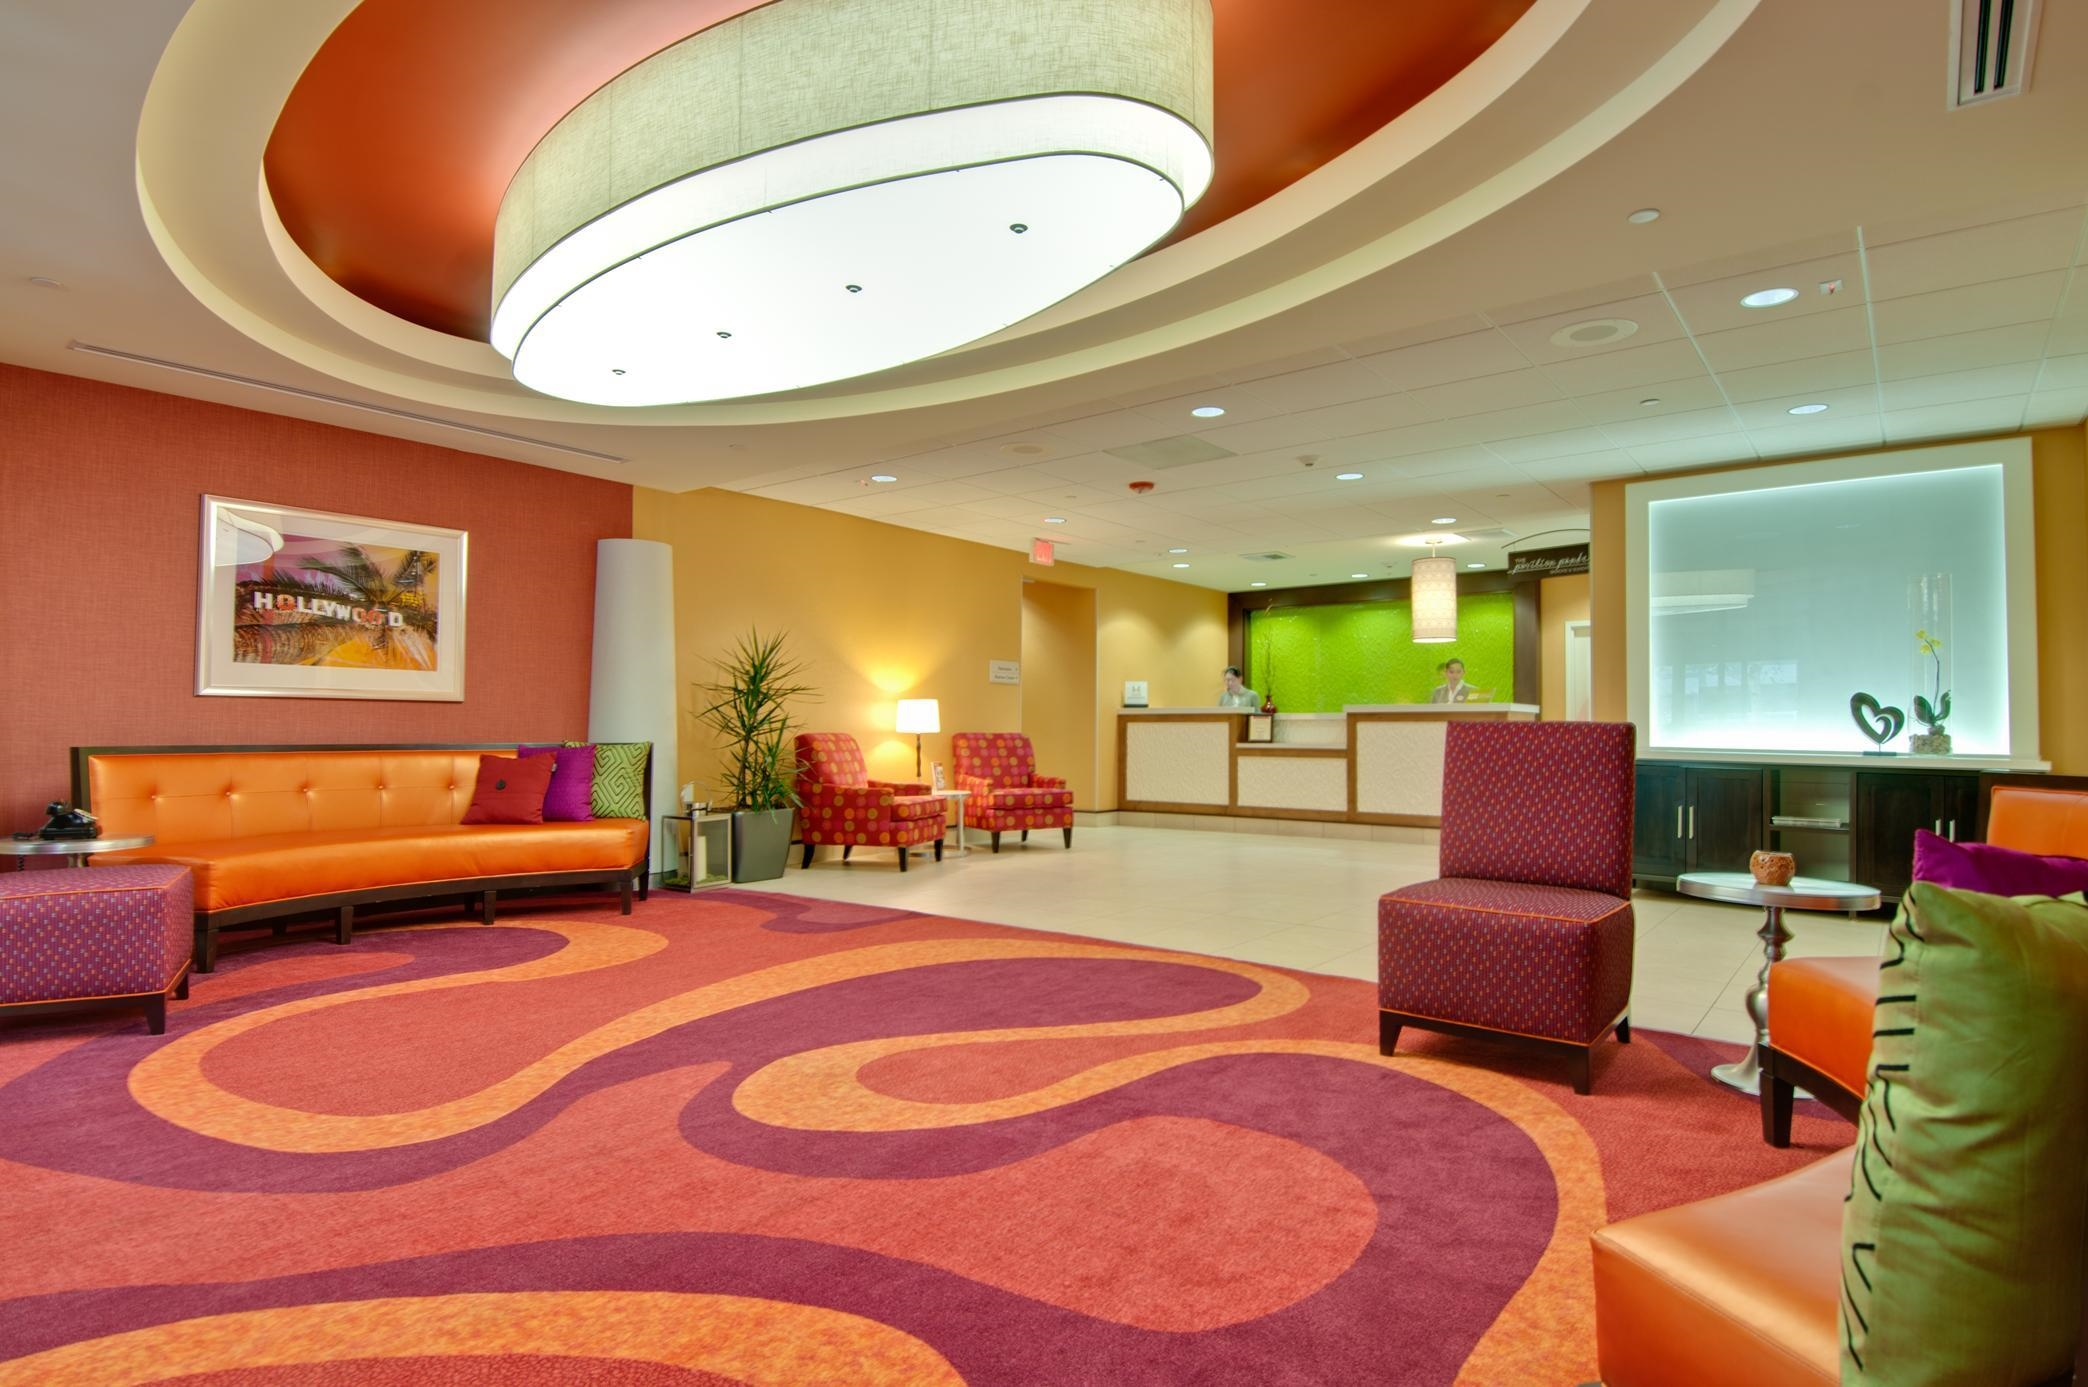 Hilton Garden Inn Los Angeles/Hollywood image 1